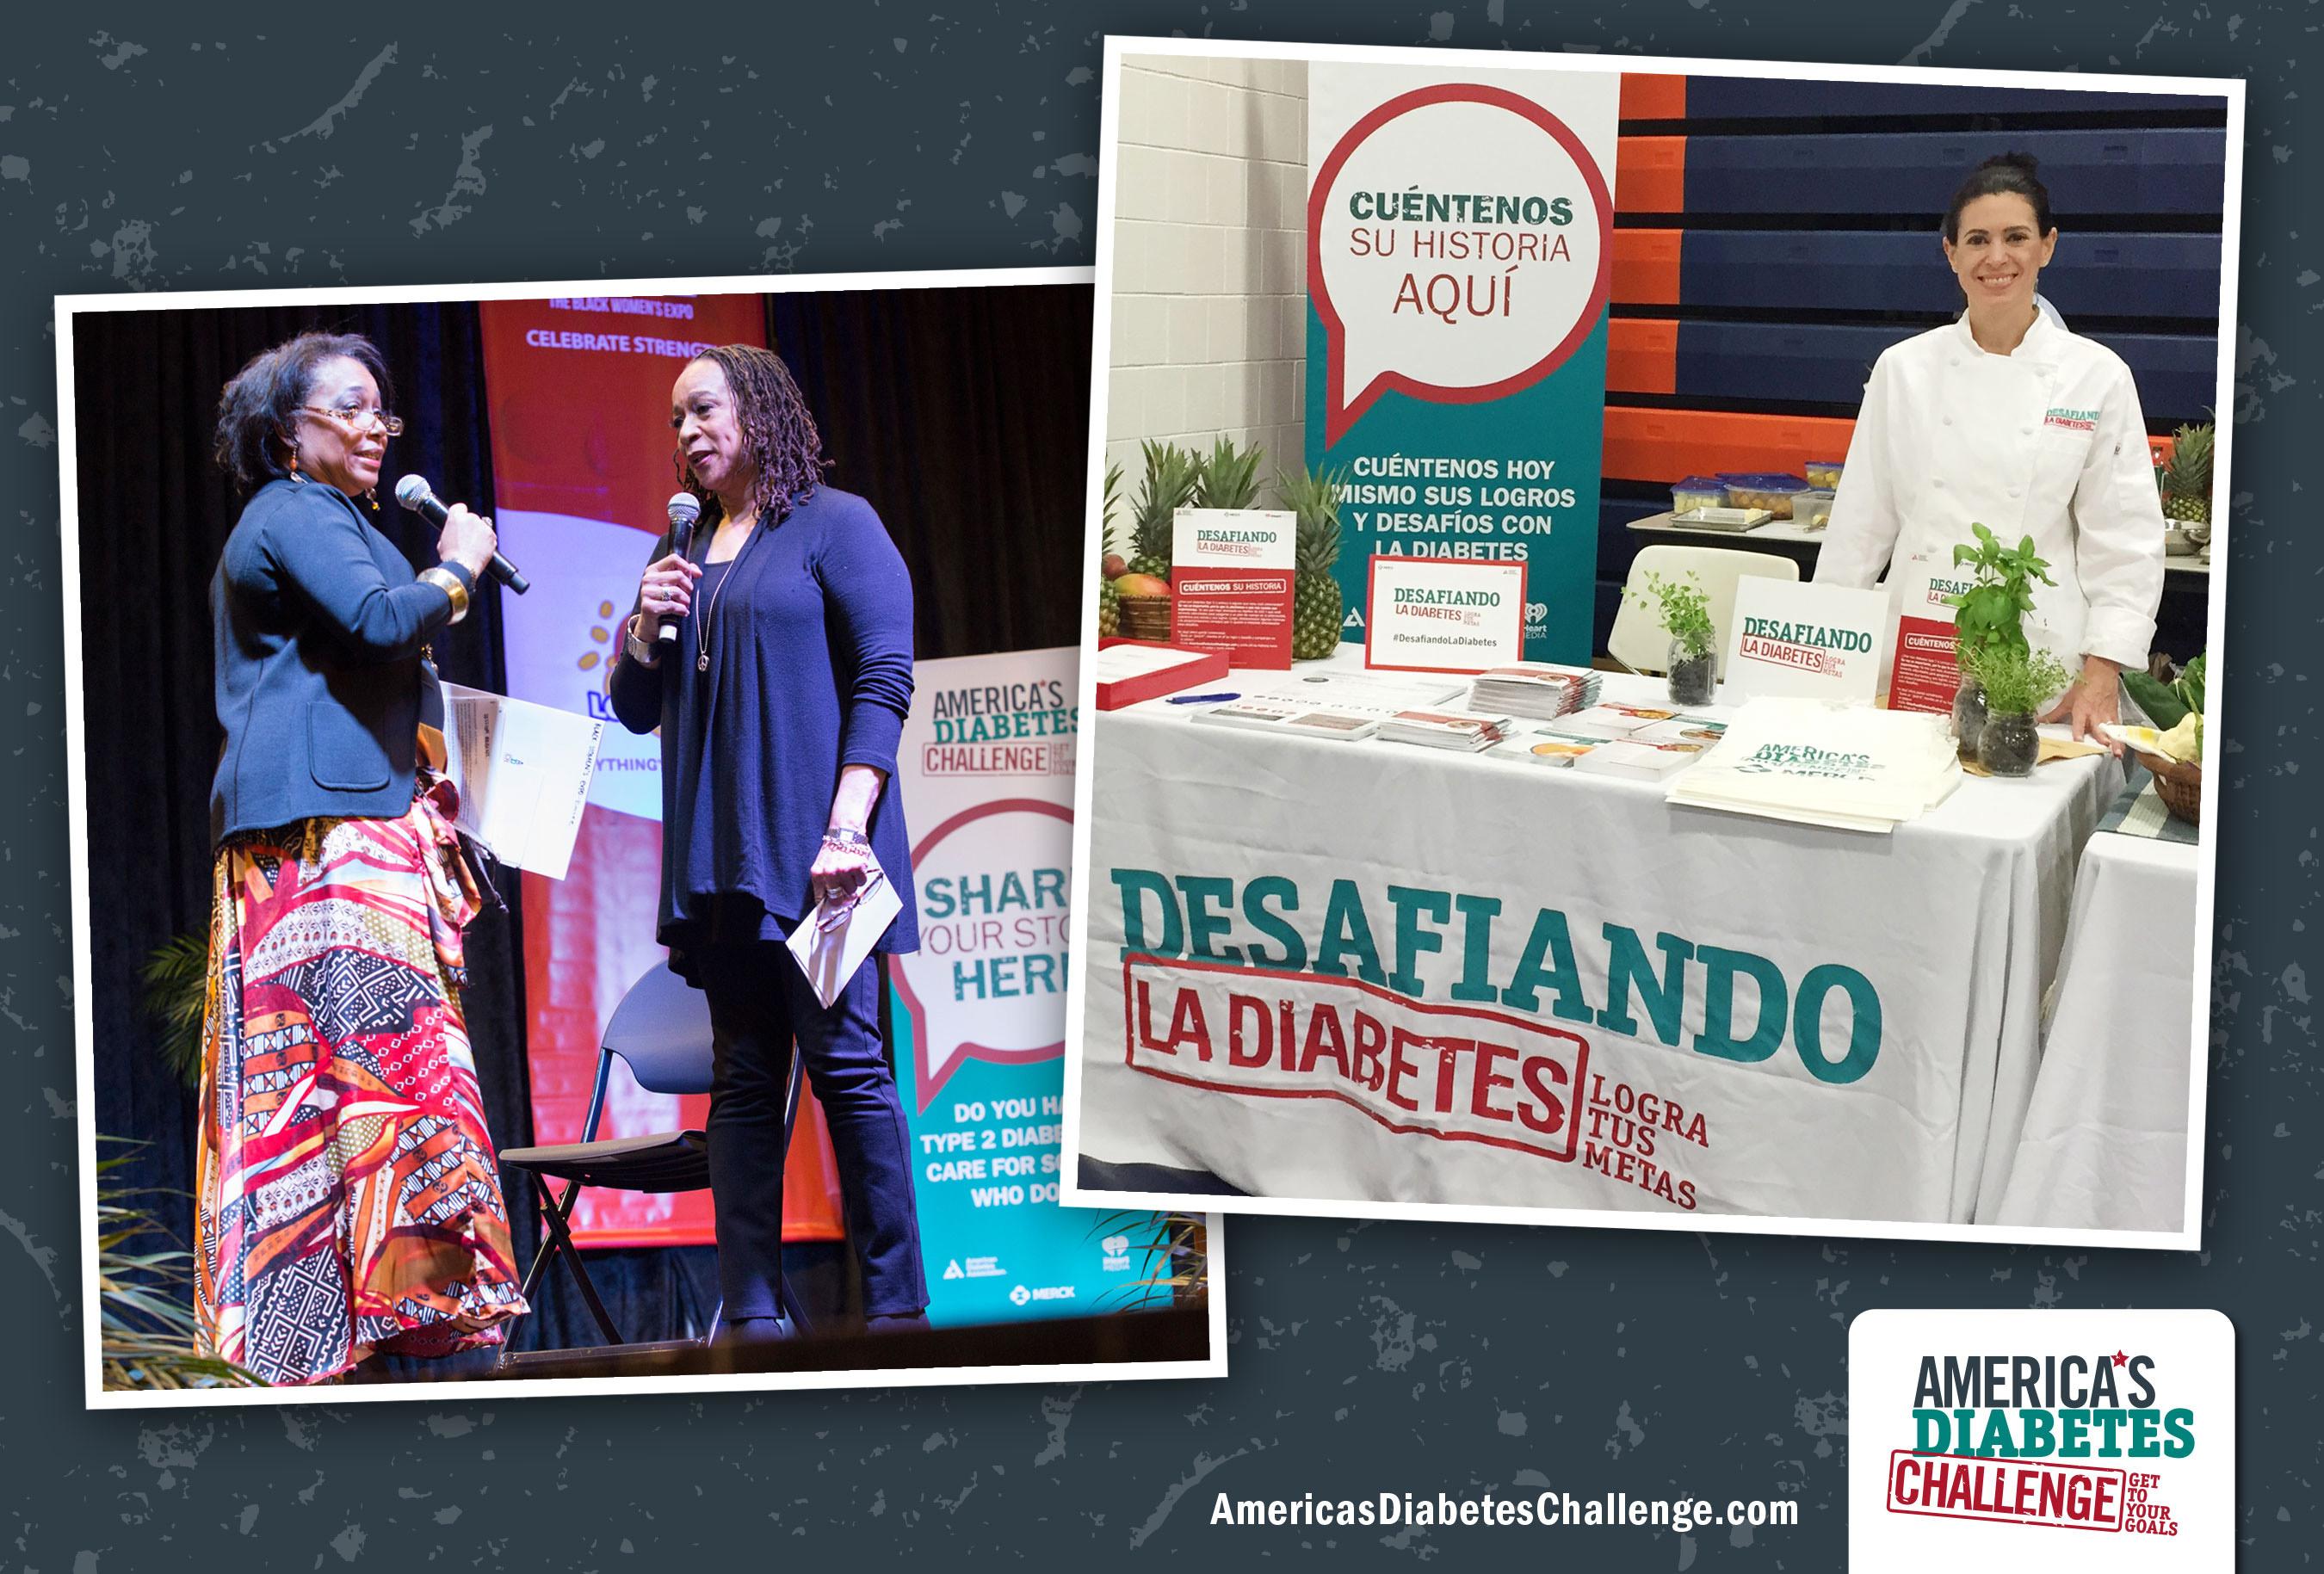 America's Diabetes Challenge Unveils Common Challenges Affecting the Type 2 Diabetes Community